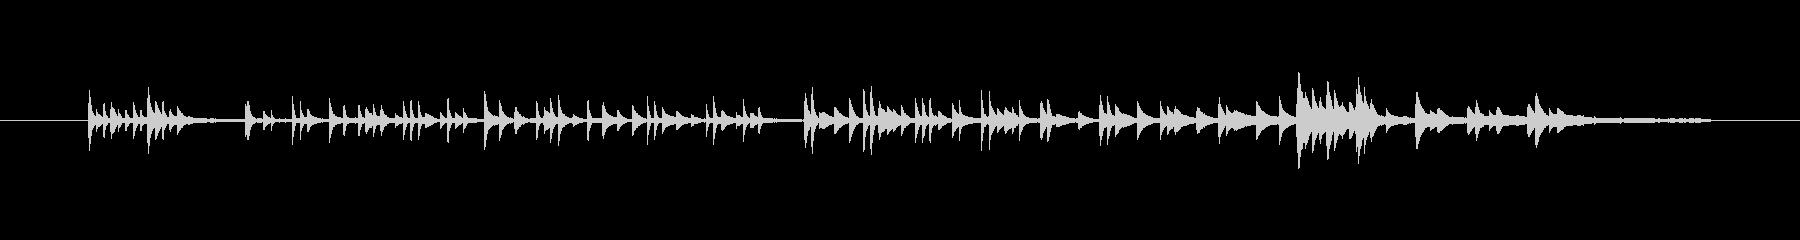 Theme PF ver1(「幸色のワンルーム」背景音楽)の未再生の波形